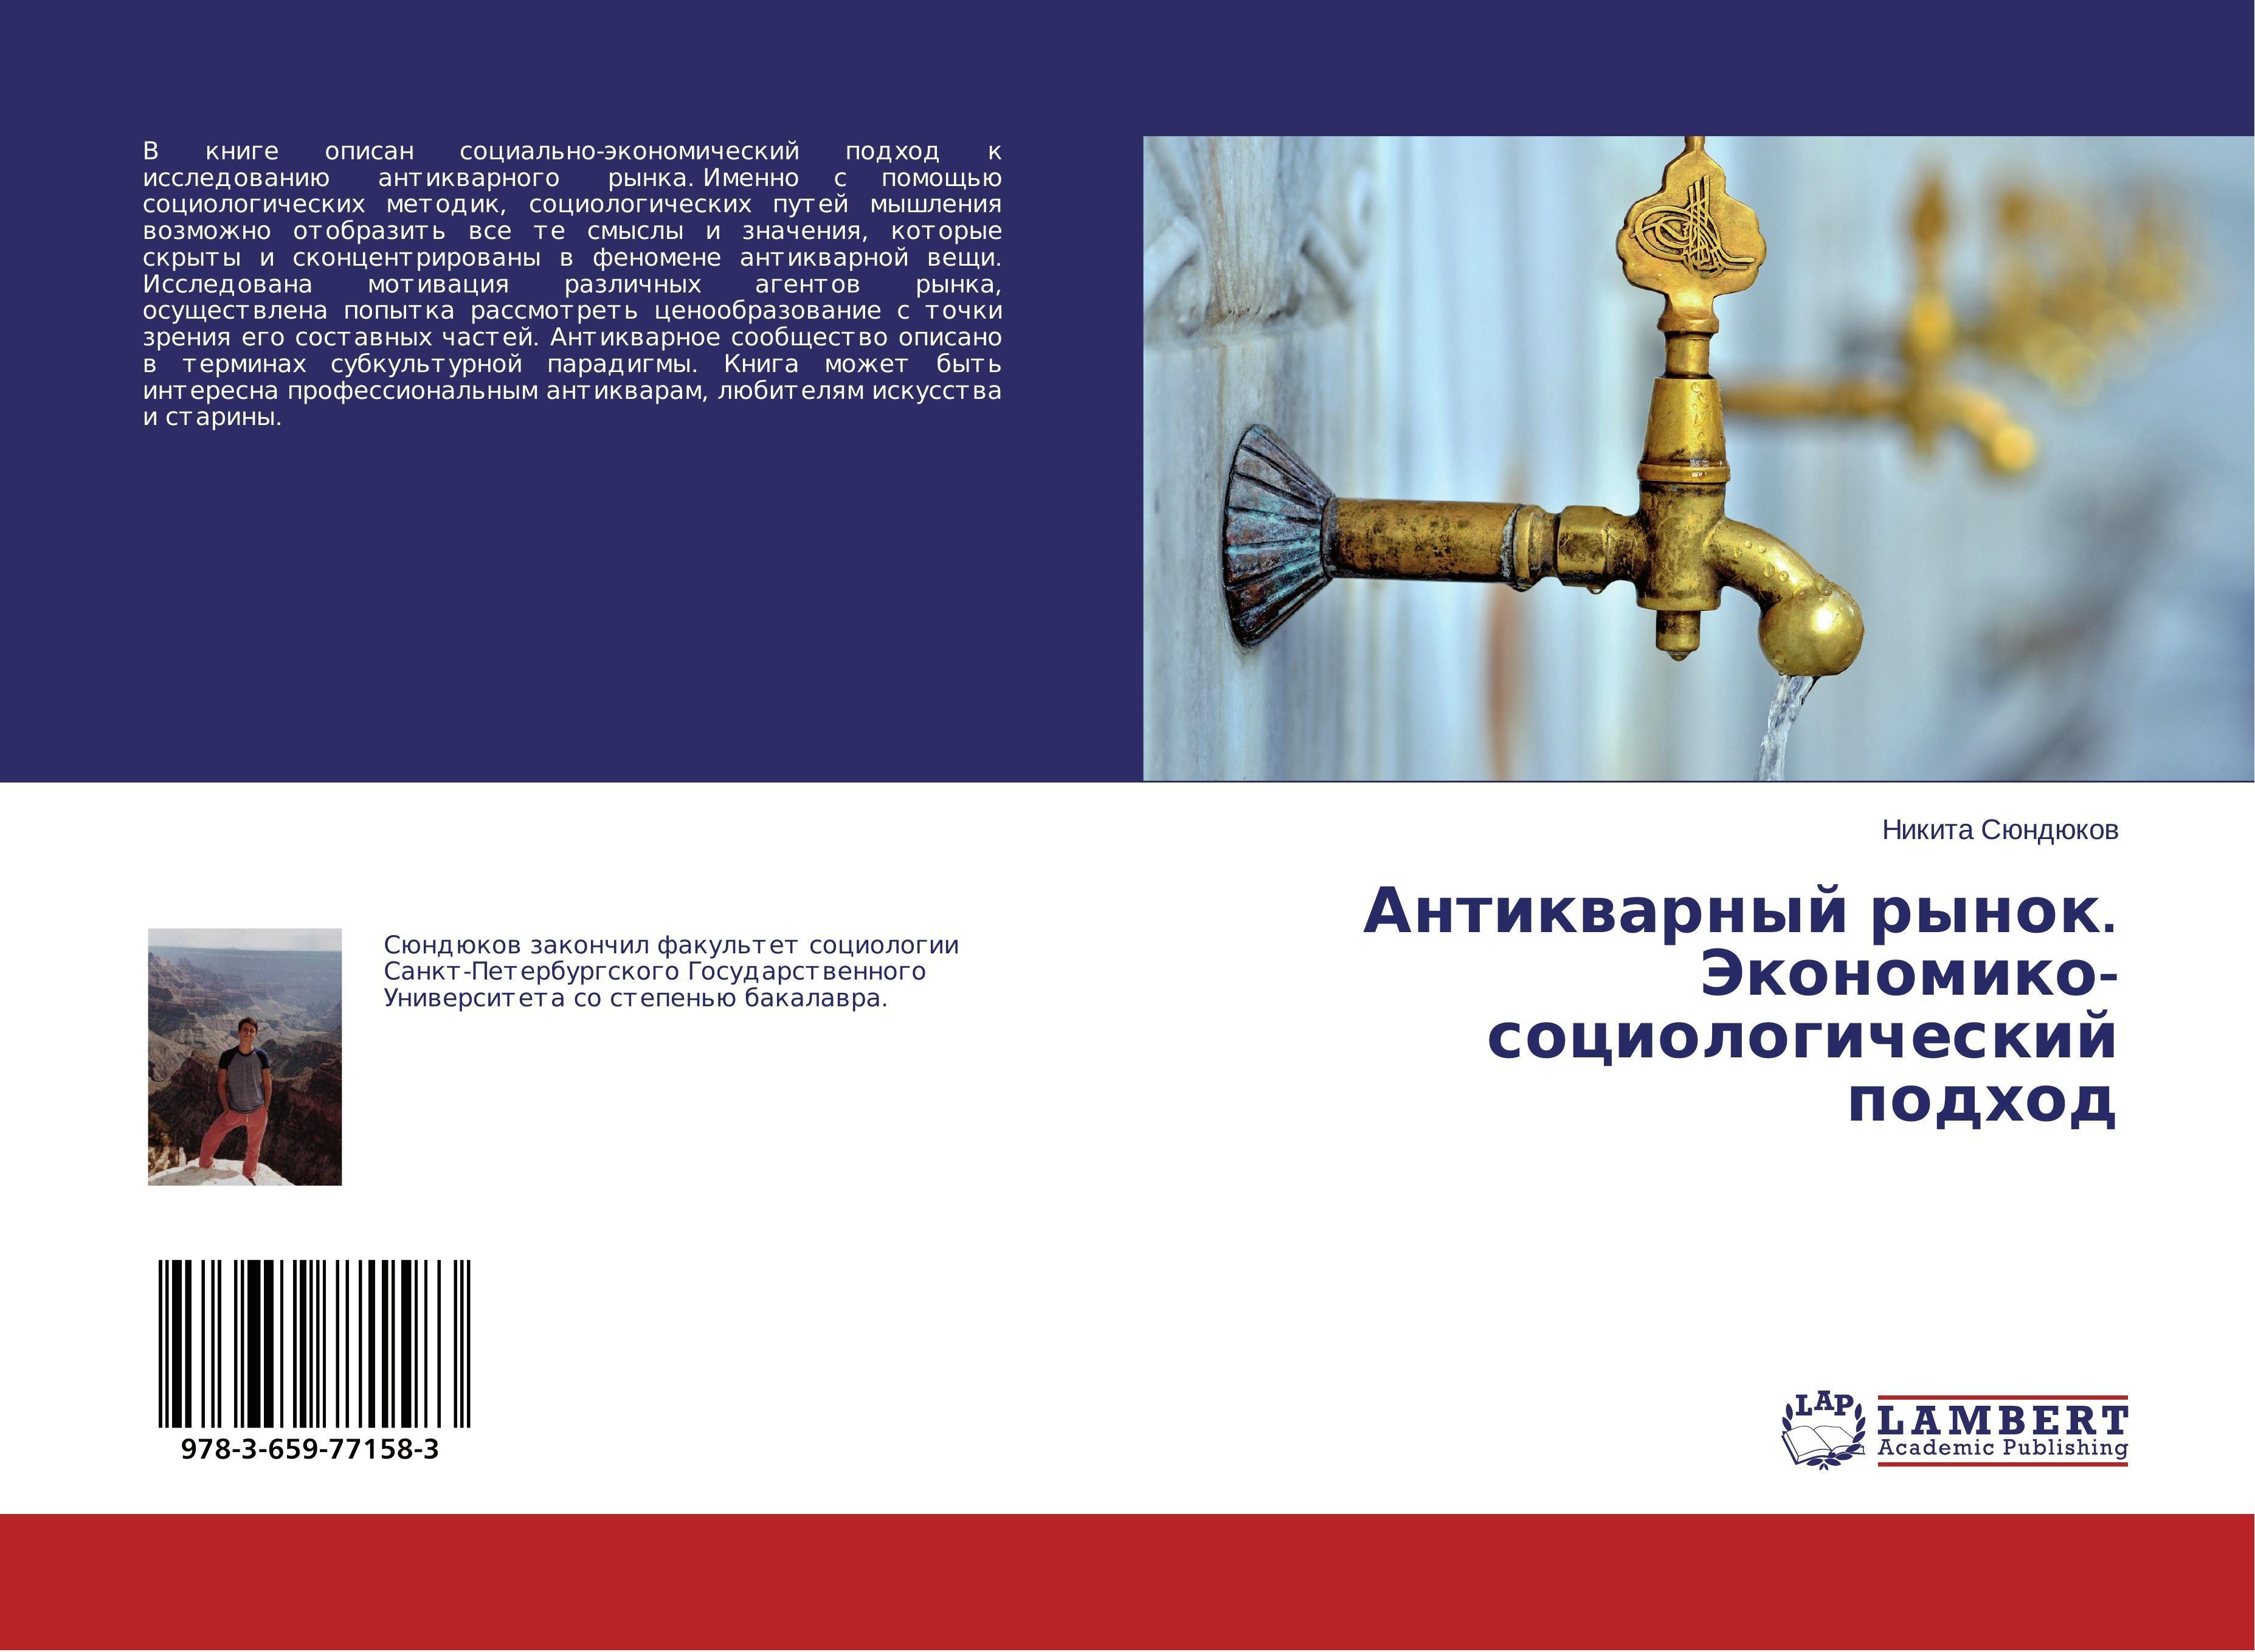 Antikvarnyj-rynok-Jekonomiko-sociologicheskij-podhod-Niki-9783659771583